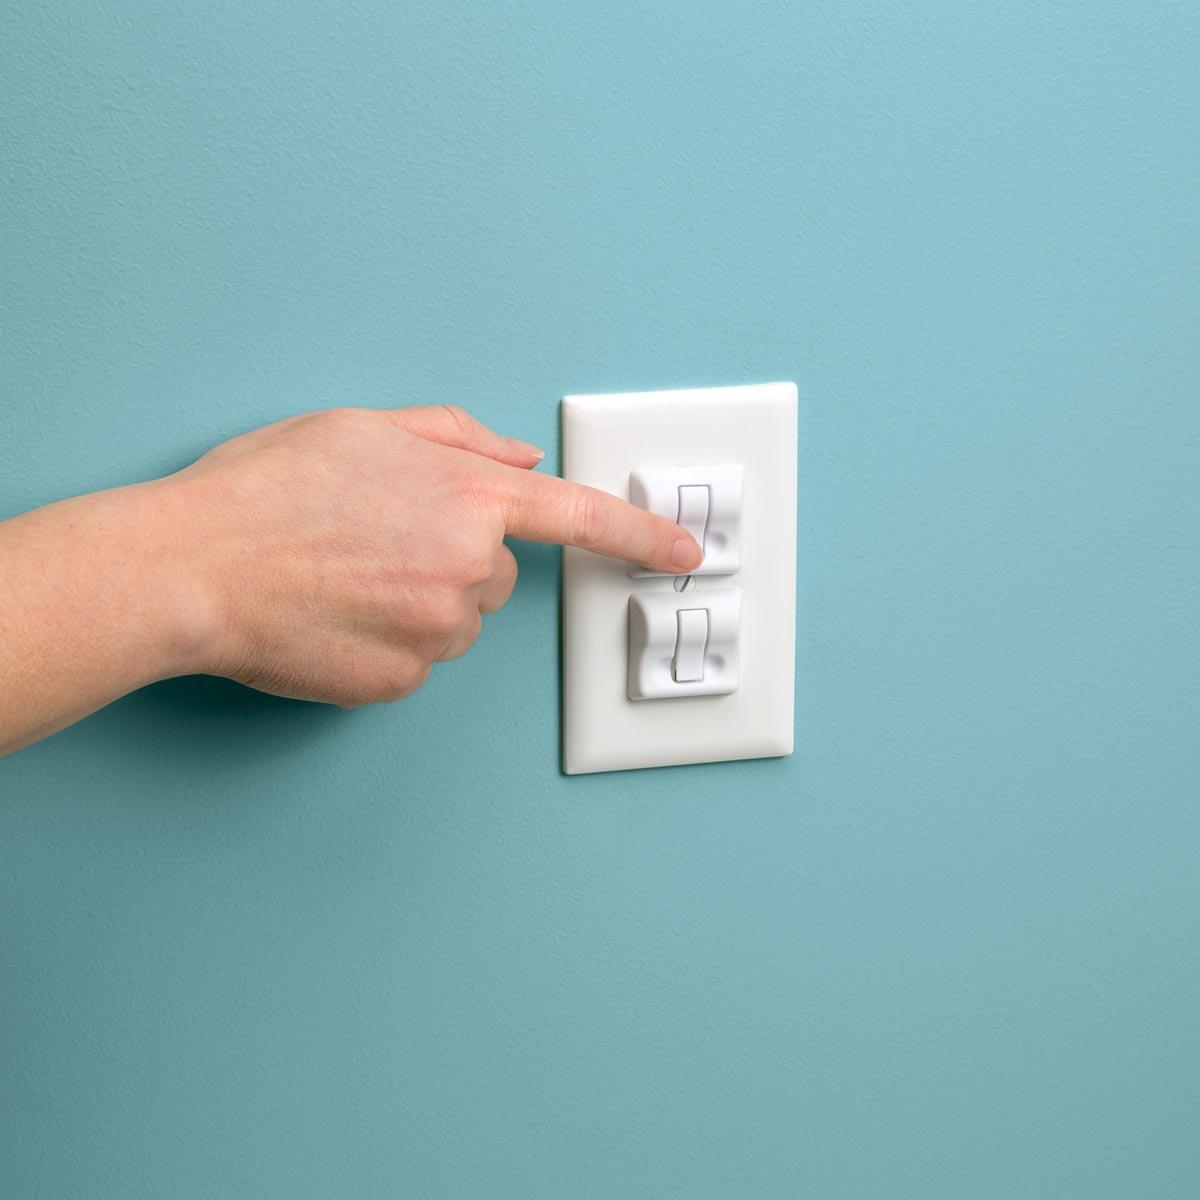 Safety 1st Press Tab Plug Protectors